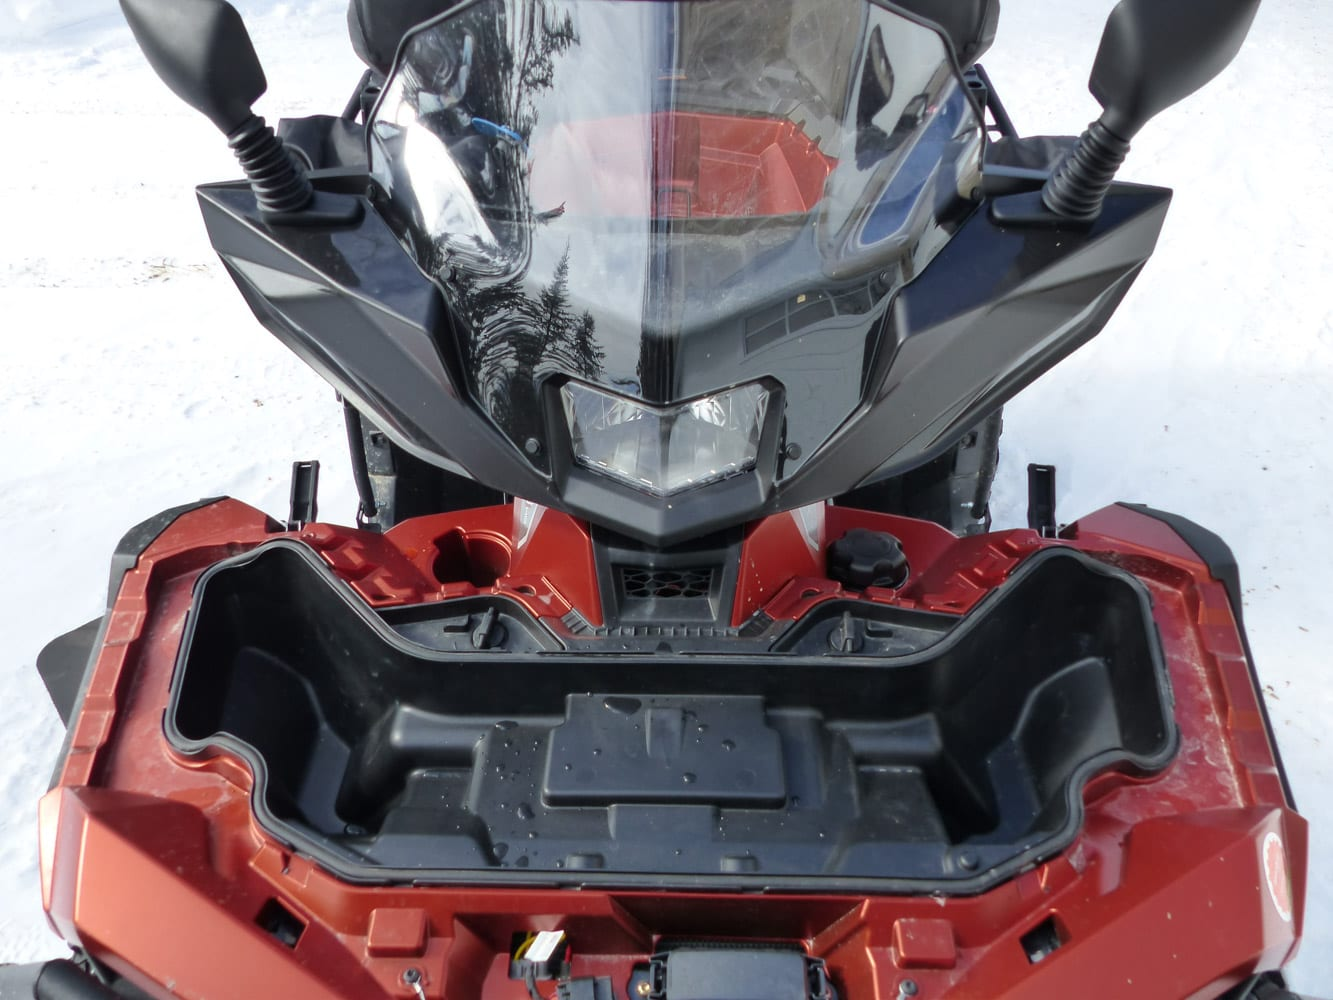 2020 Polaris Sportsman 850 Premium Trail Edition Review